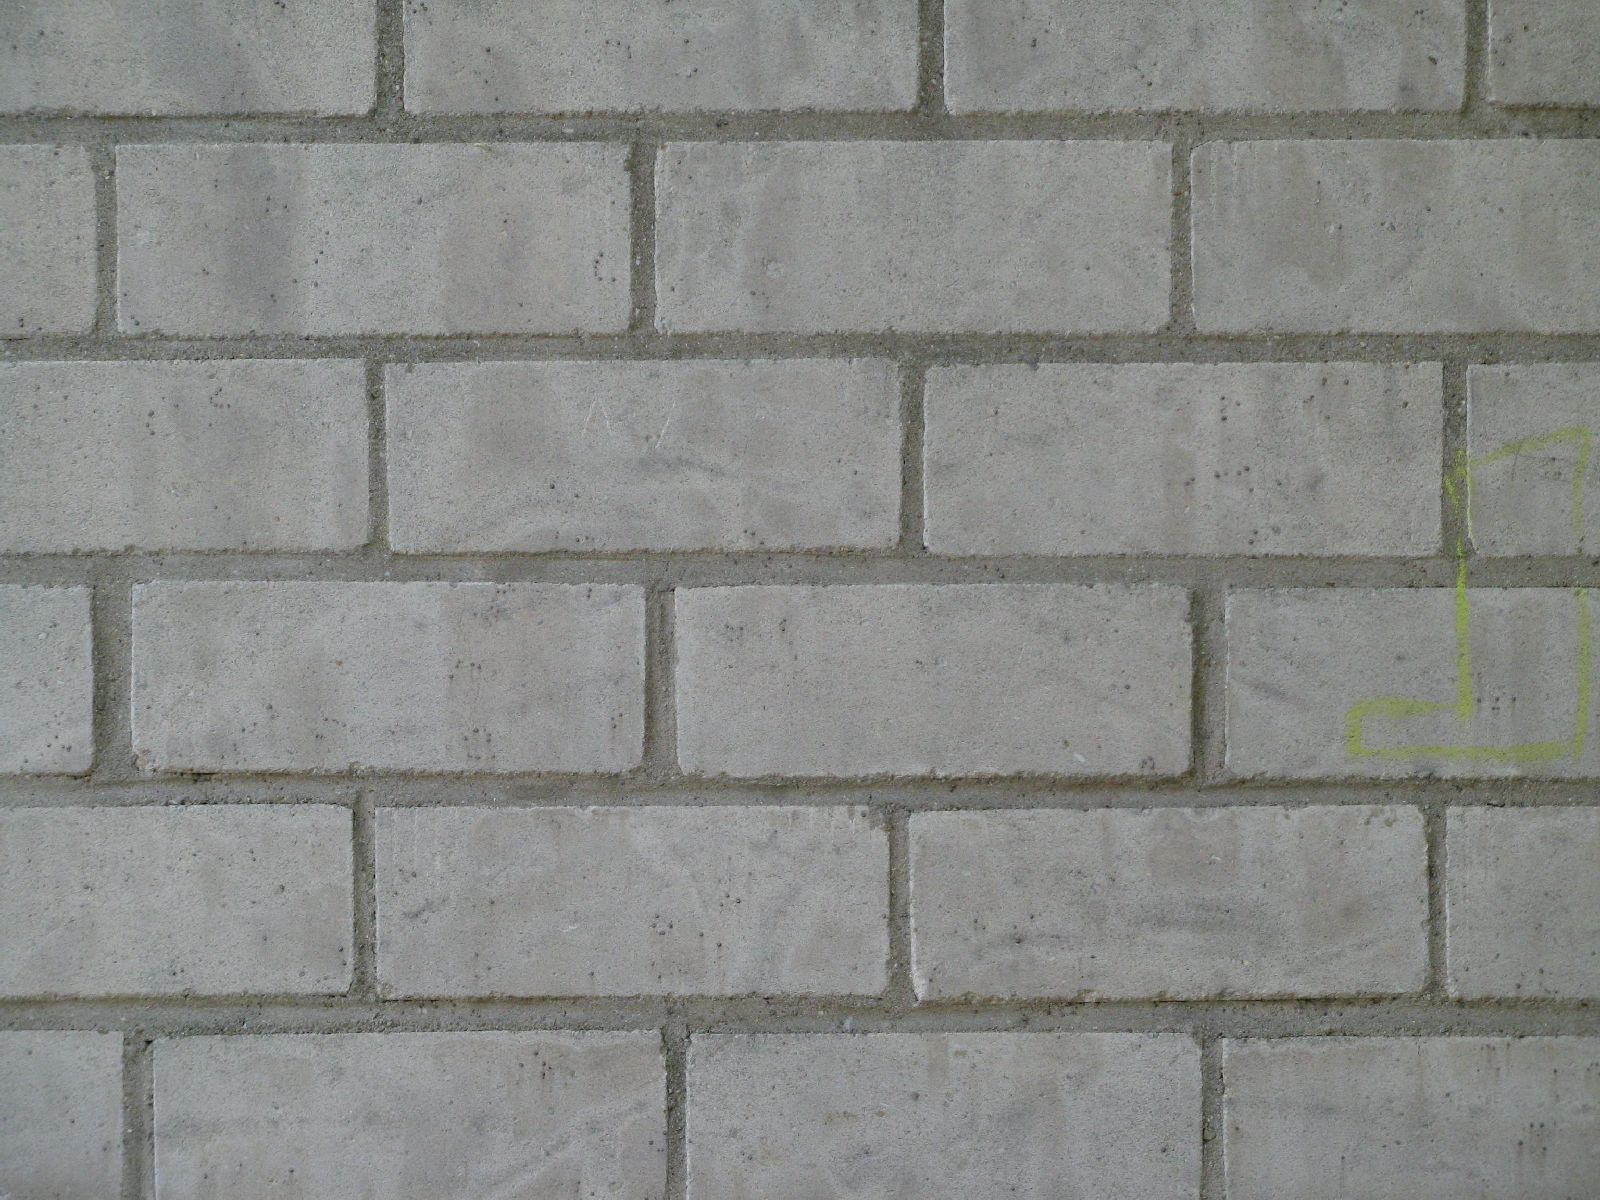 Brick_Texture_B_0027